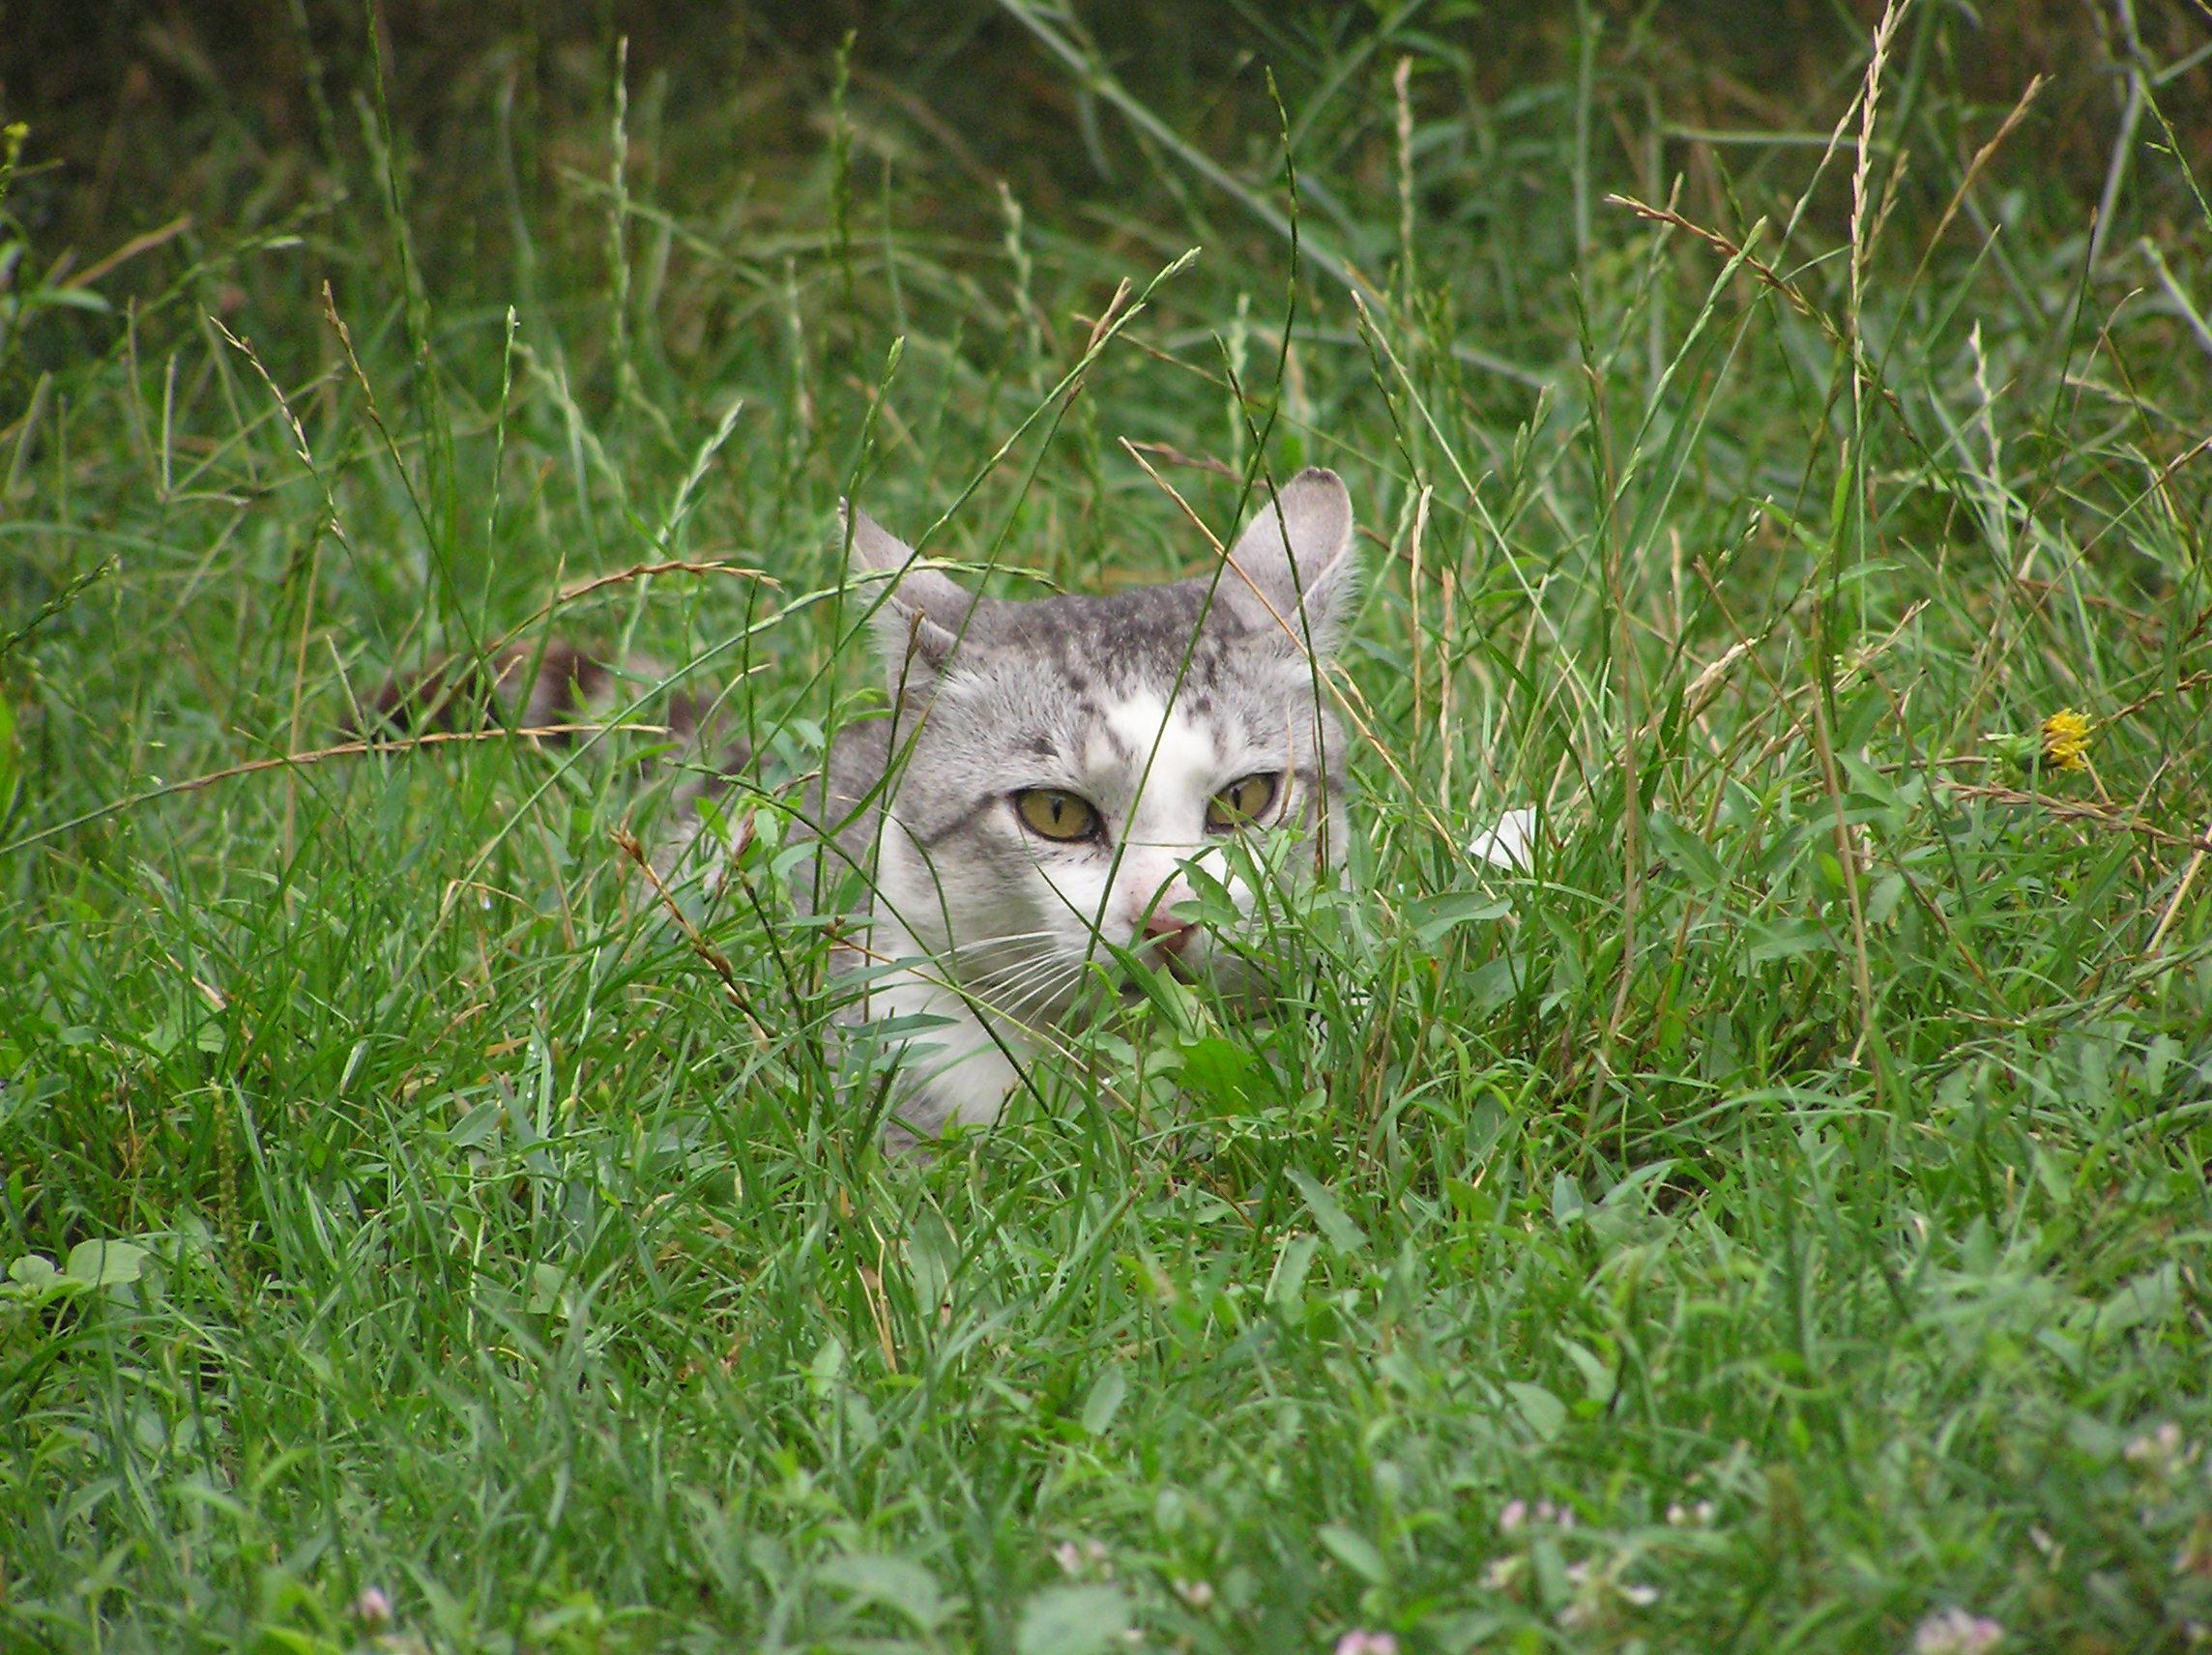 Lurking_cat.jpg&f=1&nofb=1